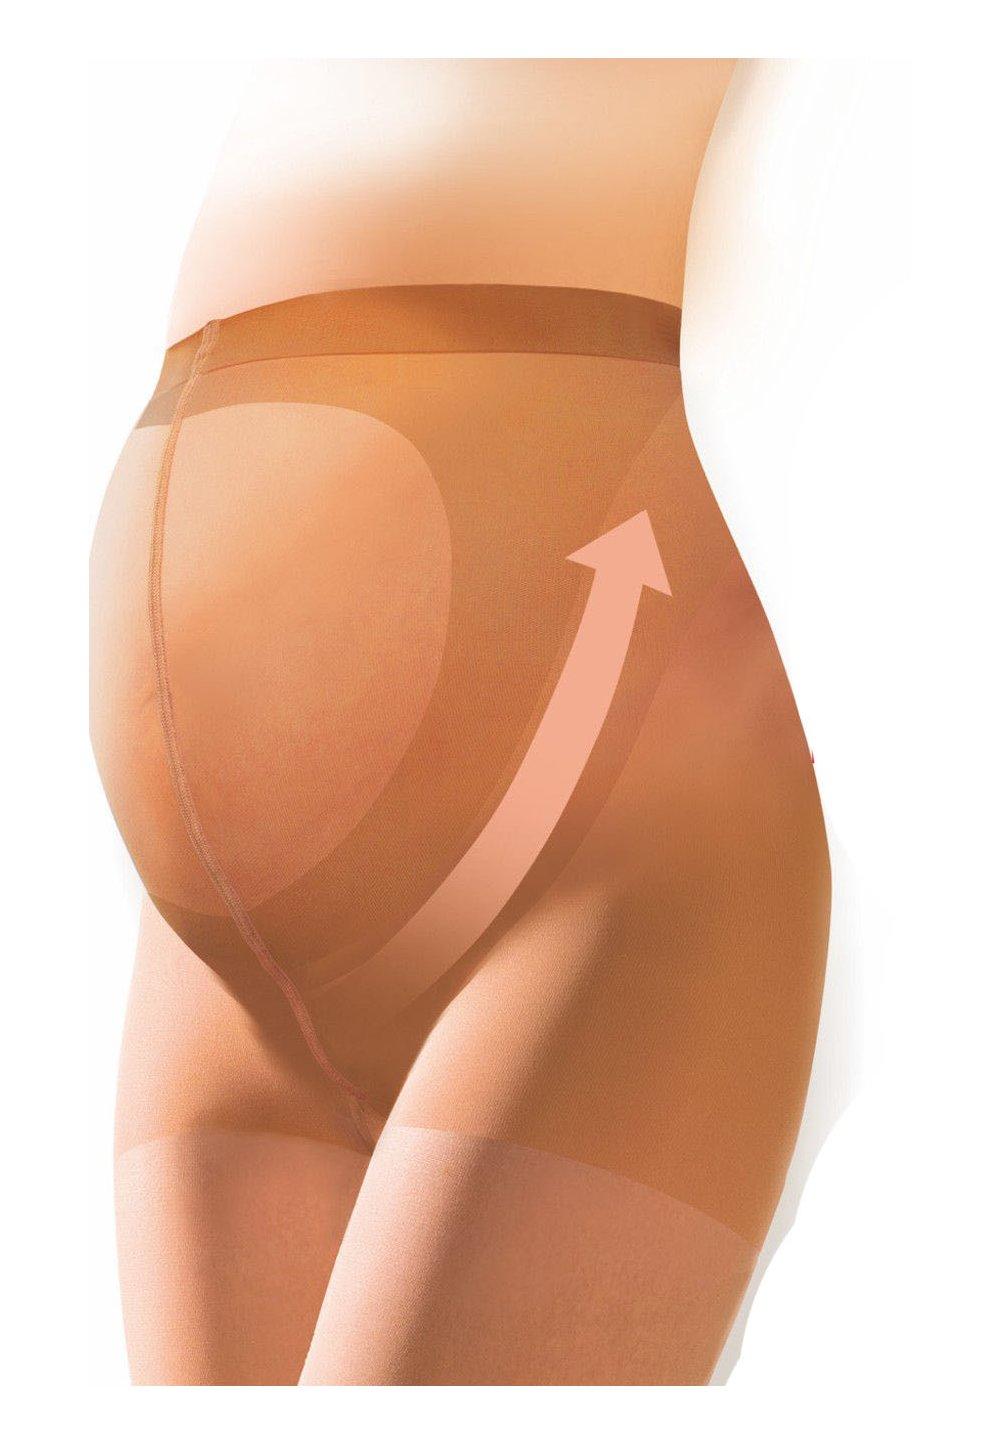 Ciorapi cu chilot gravide,bej, 40 Den imagine